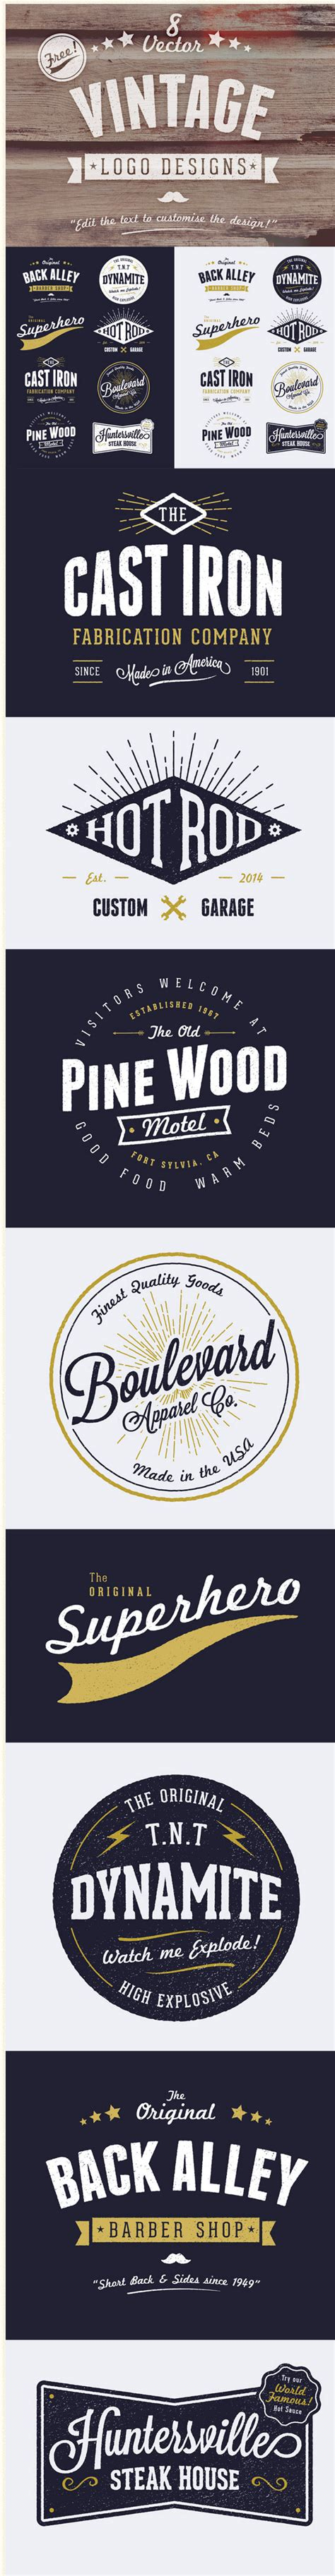 desain logo online free download vector vintage gratis untuk desain logo